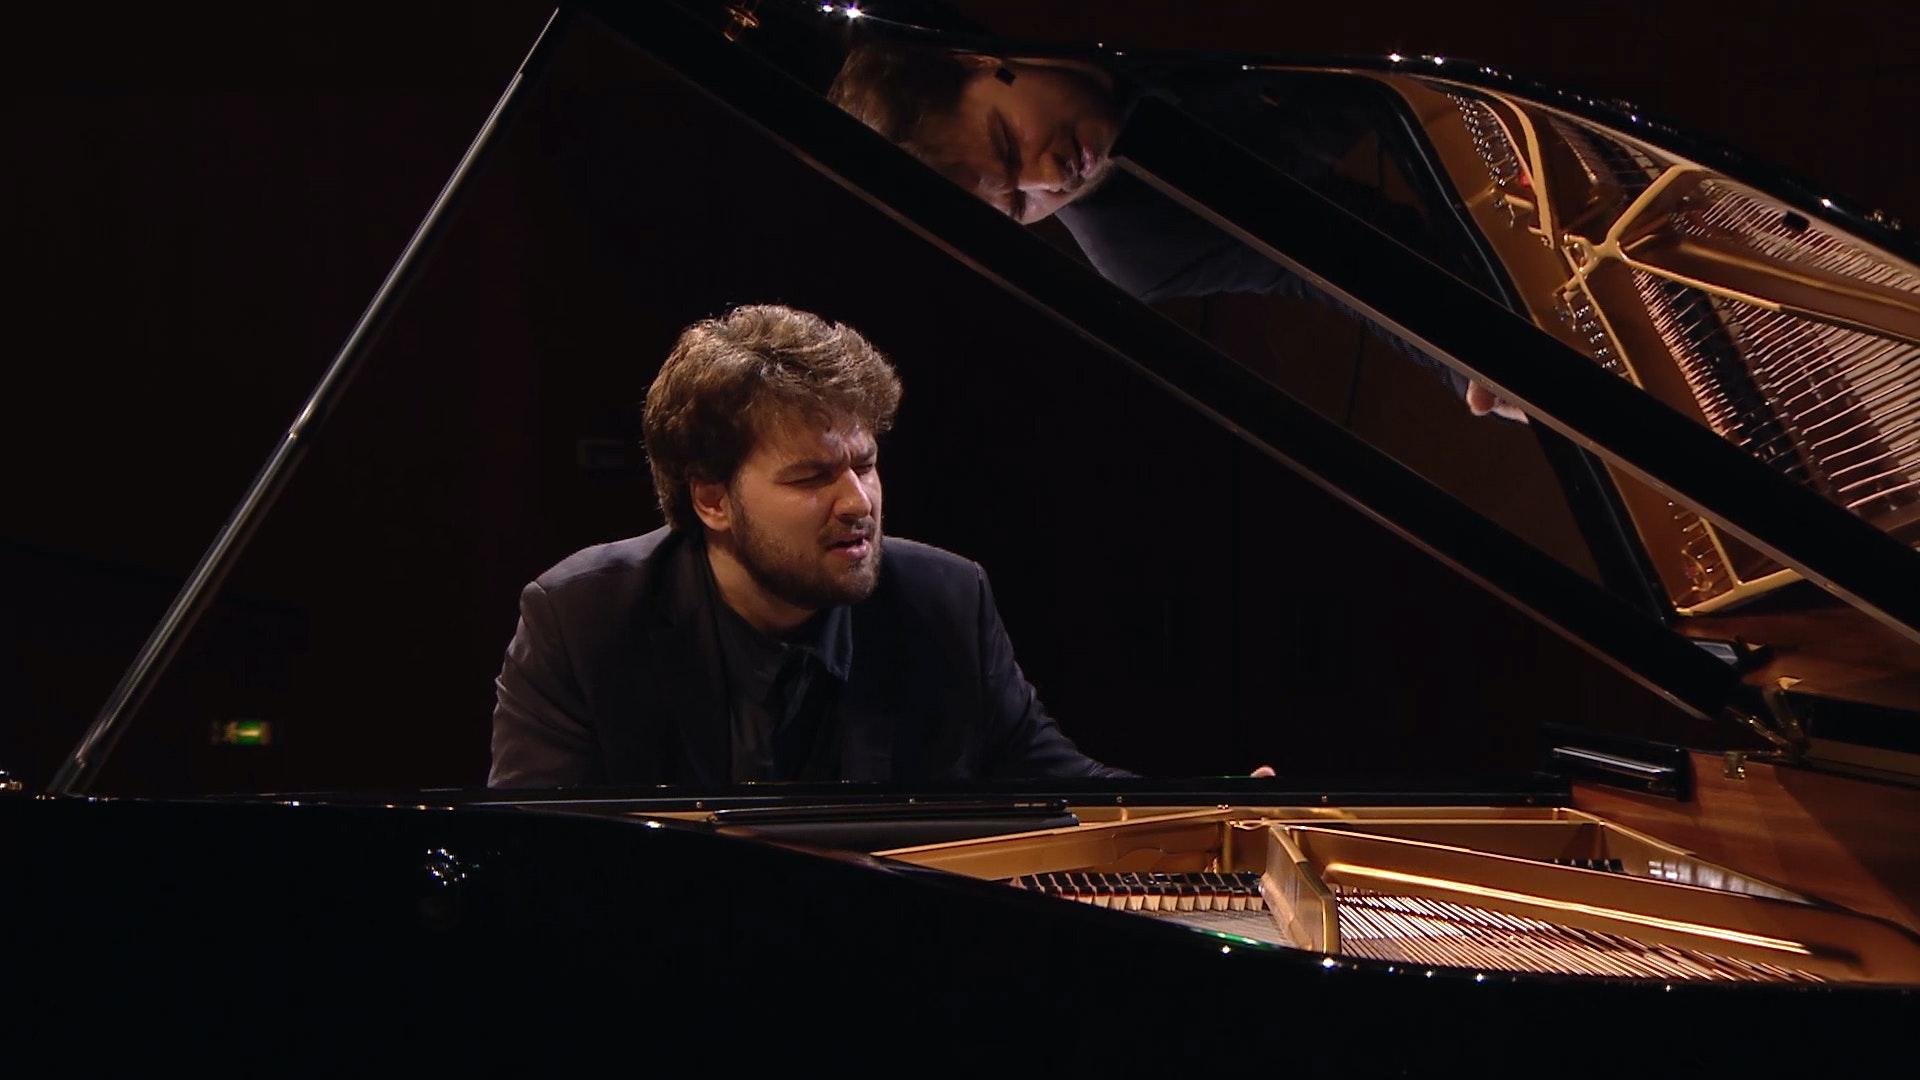 Lukas Geniušas joue la Sonate pour piano n°5 de Prokofiev